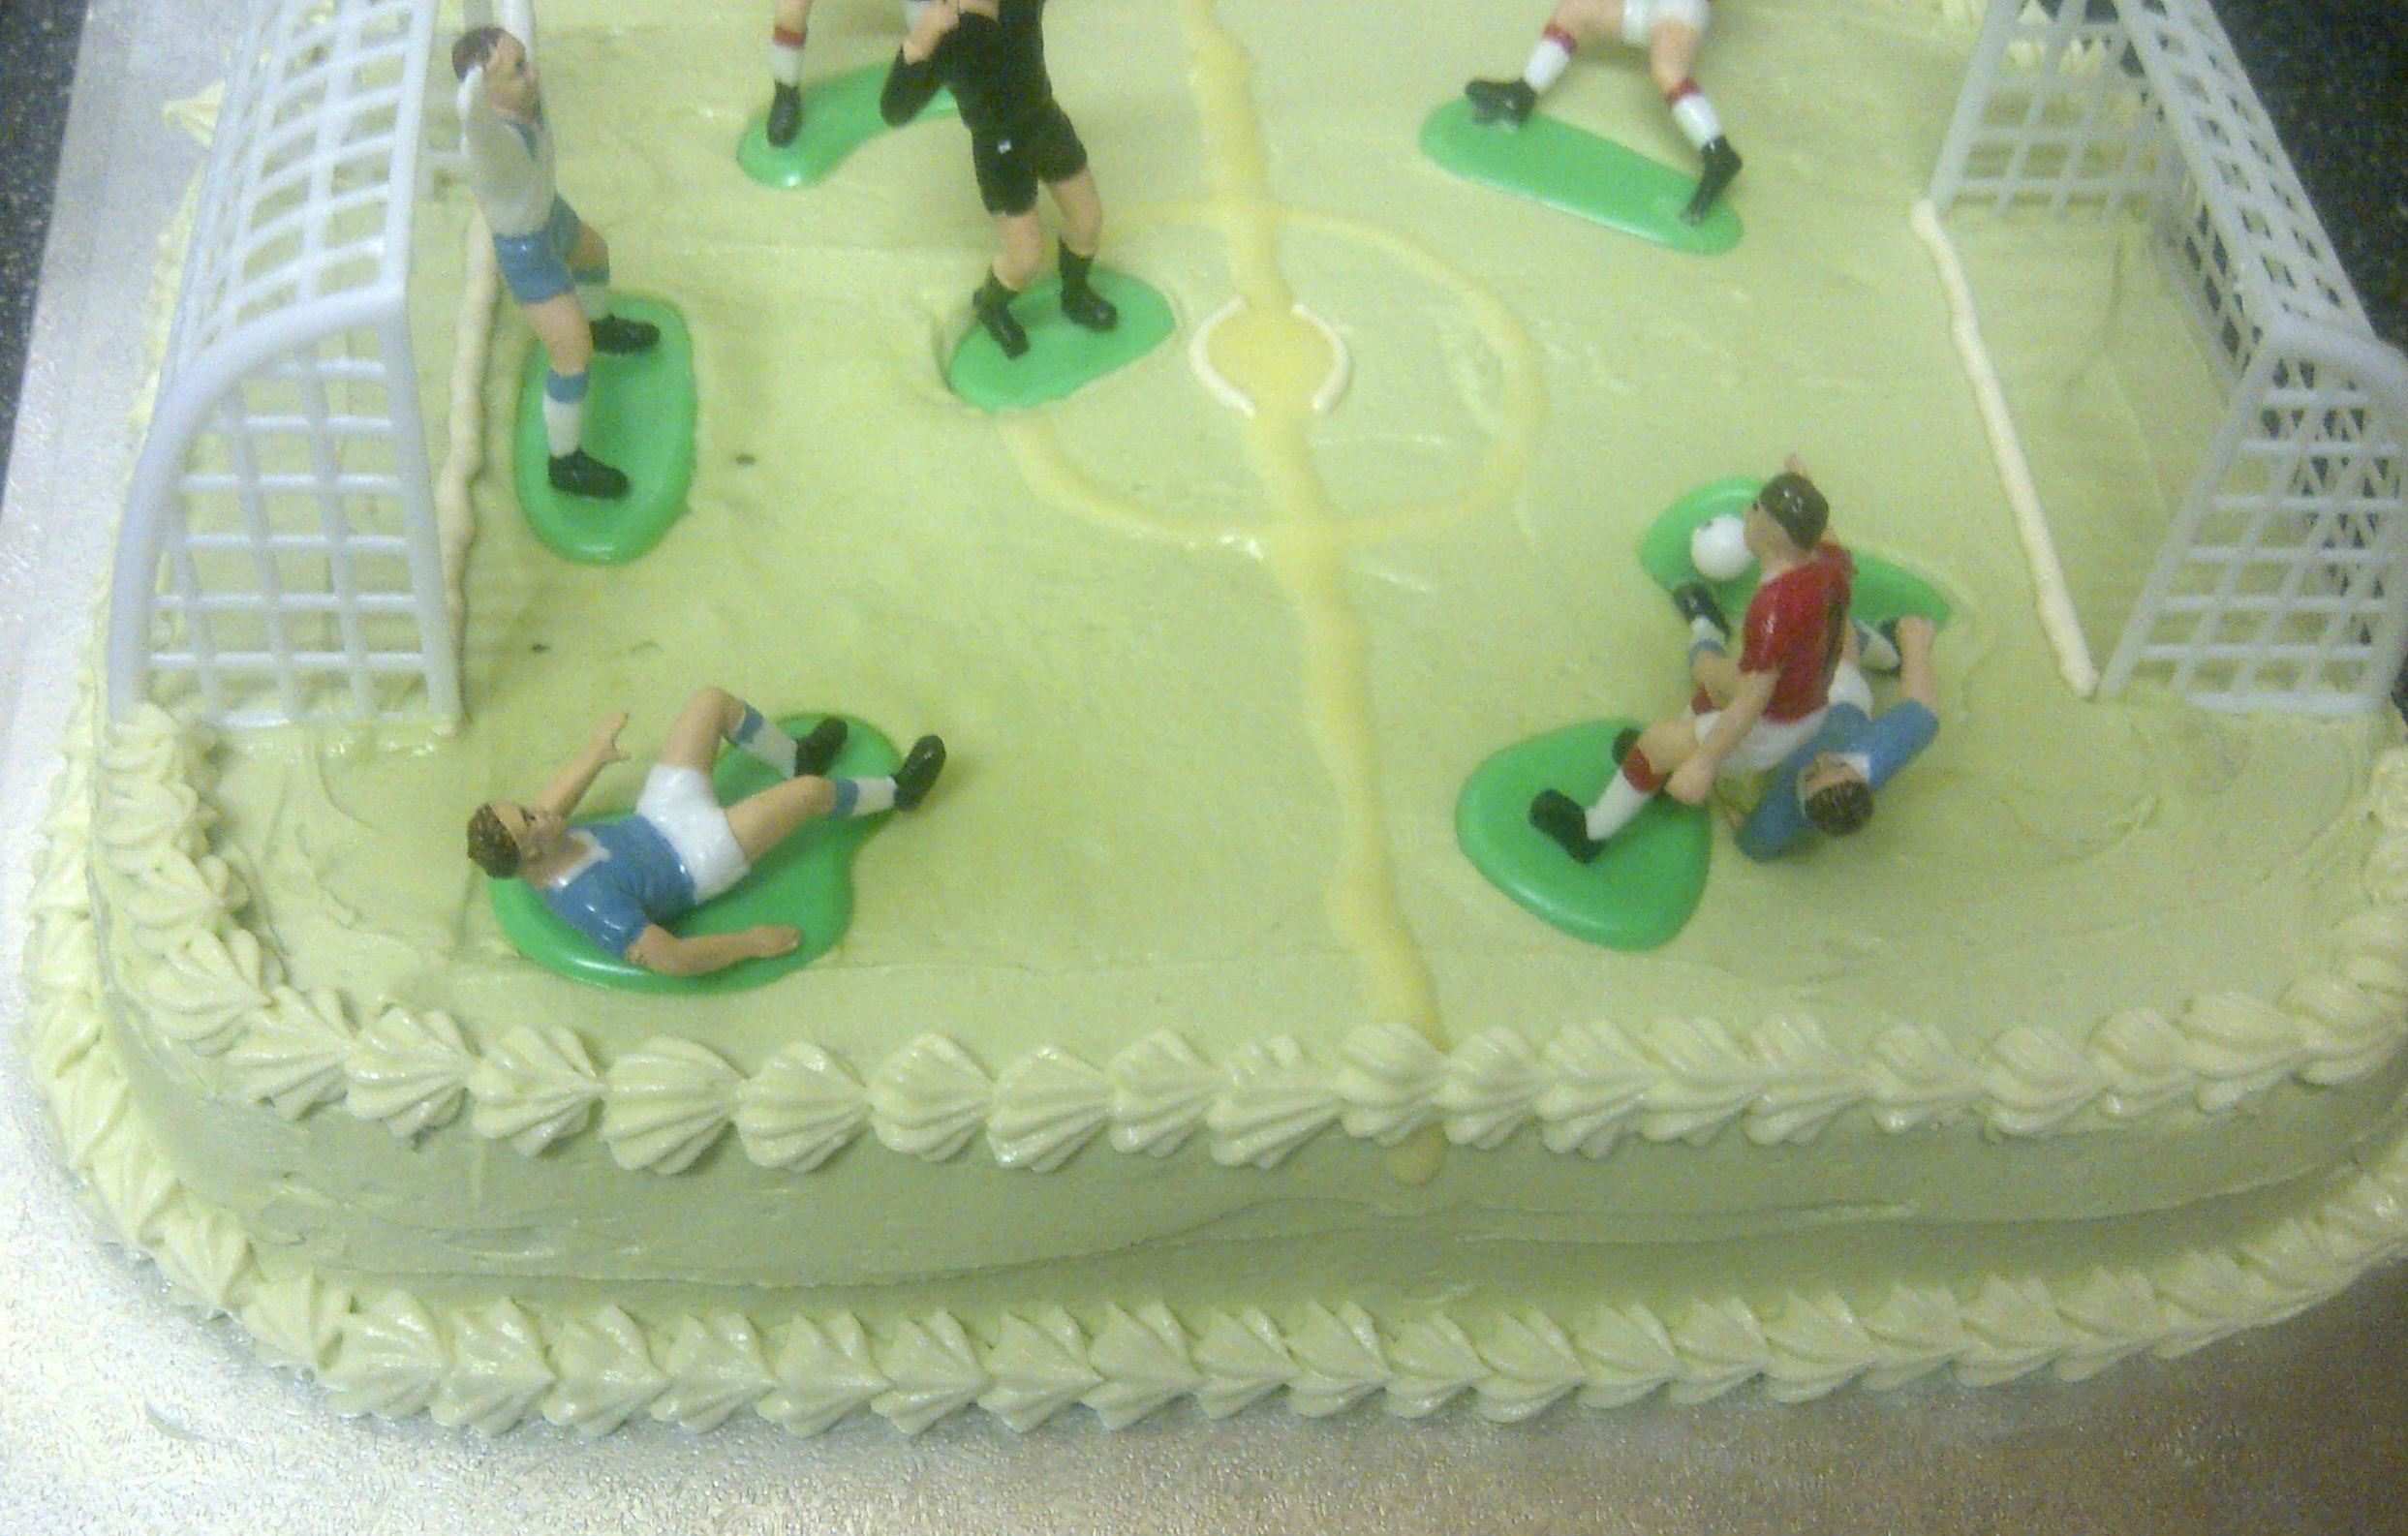 Football Pitch Cake Recipe